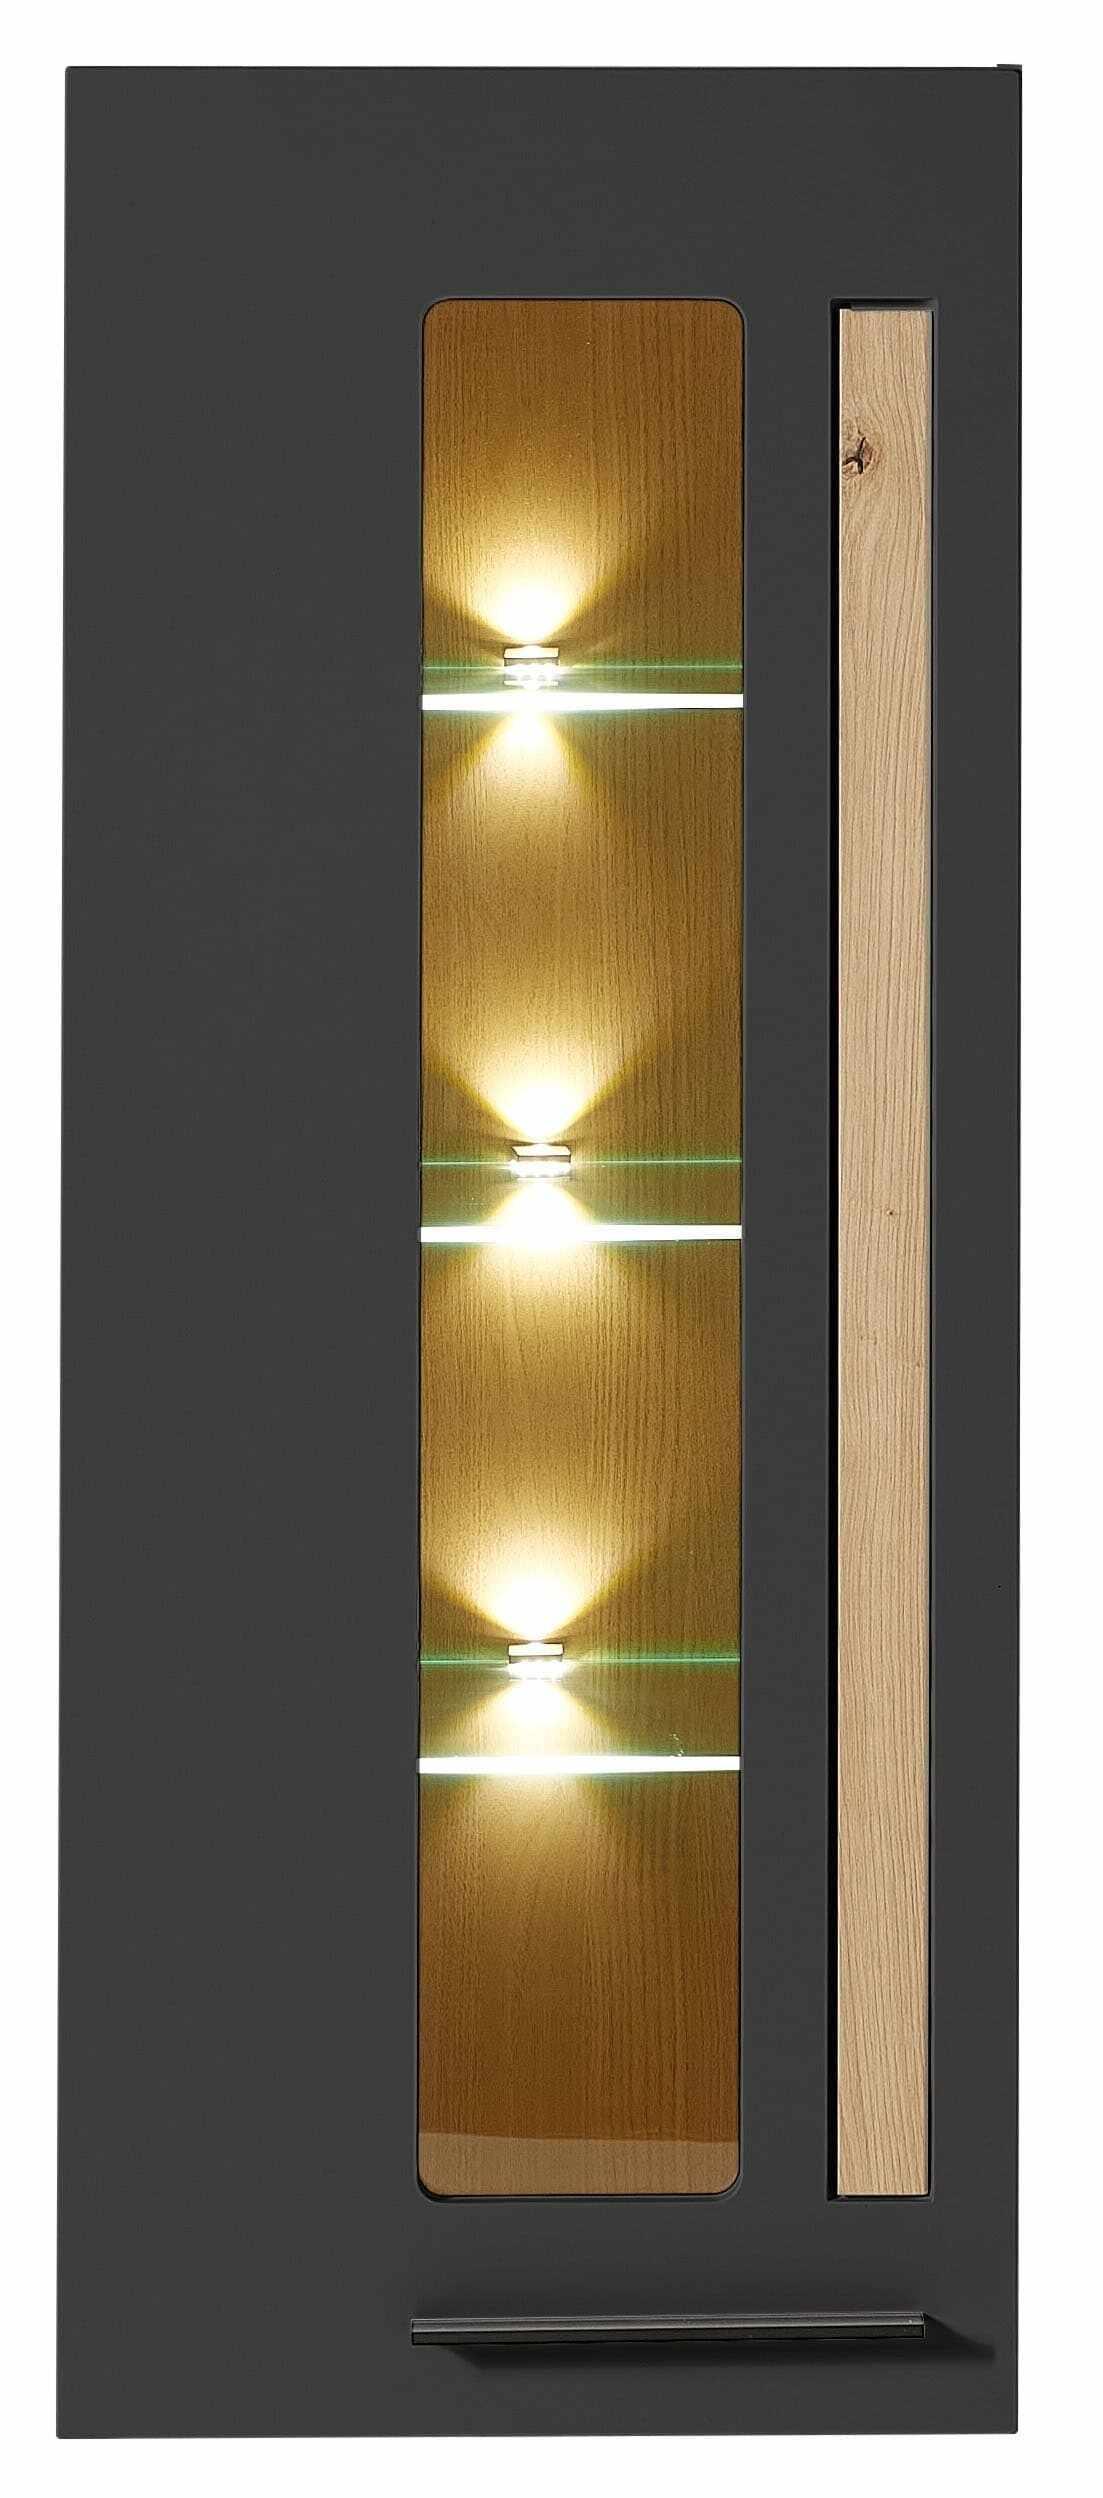 Vitrina suspendata din MDF, cu 1 usa si LED inclus Loftis Grafit / Stejar, l52xA37xH128 cm la pret 1246 lei